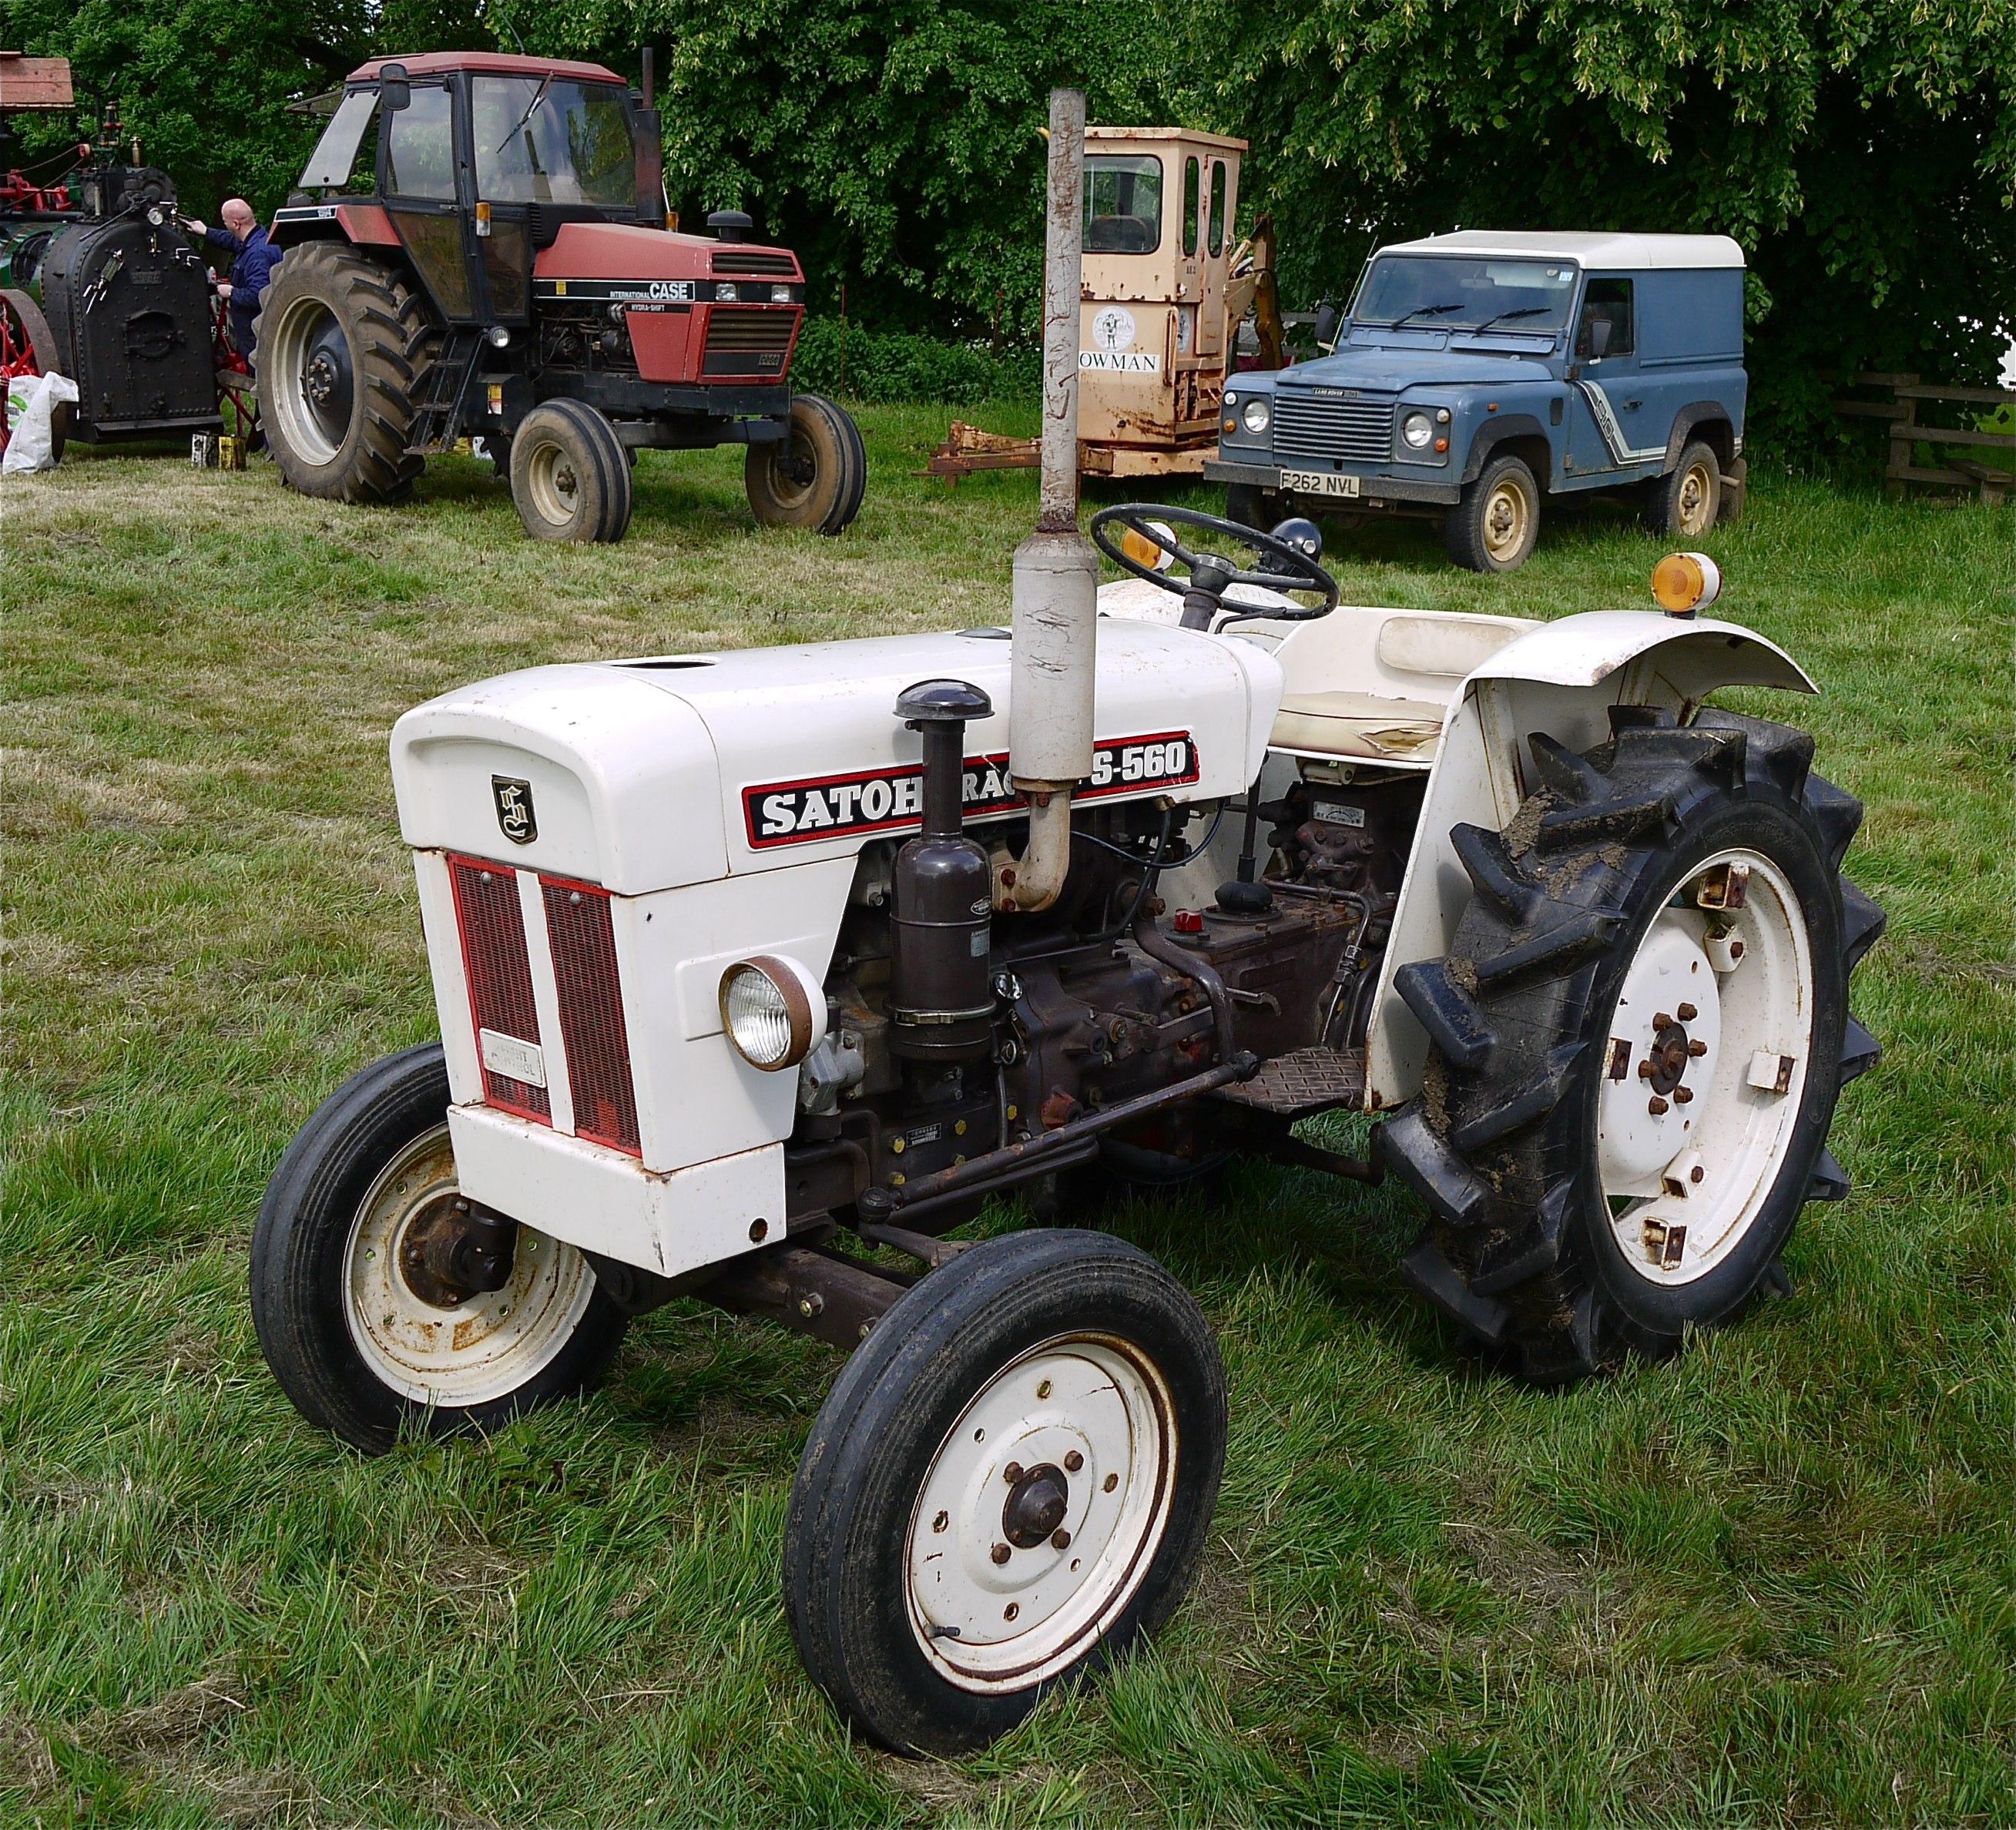 Mitsubishi Tractor Parts : Mitsubishi tractors ebay autos post